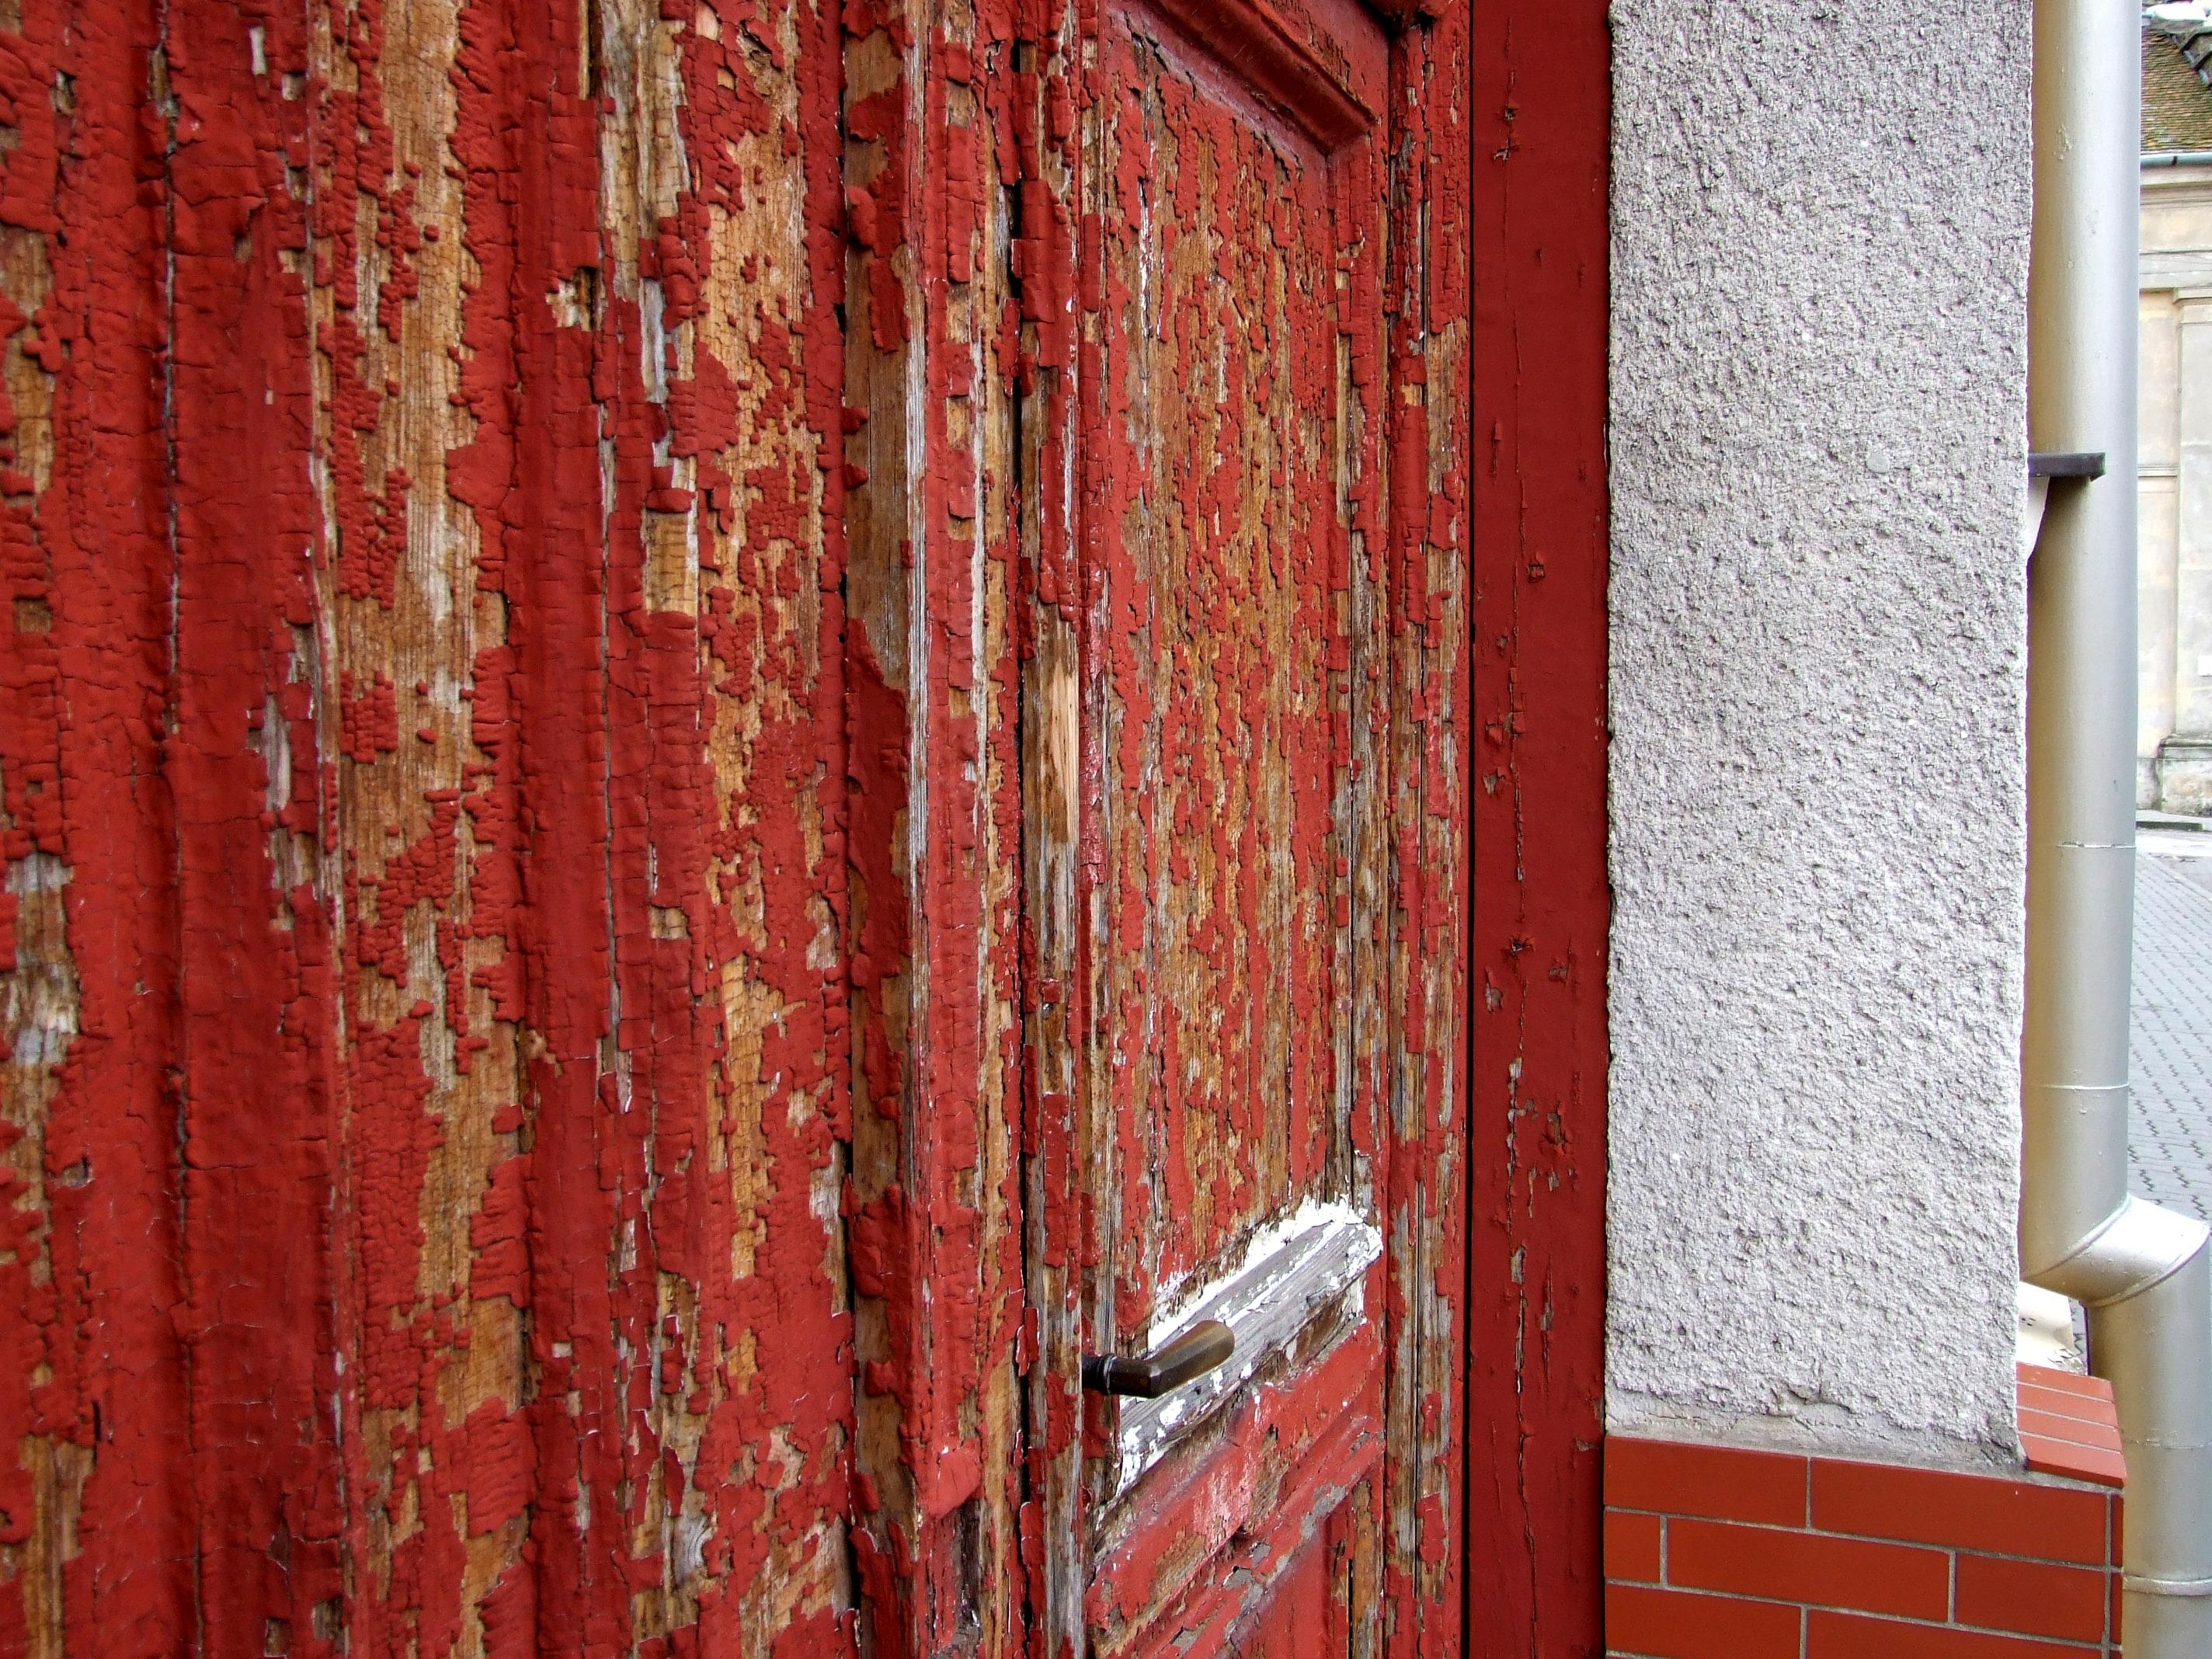 Holz Stock Fenster Alt Mauer Rot Farbe Ziegel Tür Material Innenarchitektur  Mauerwerk Bodenbelag